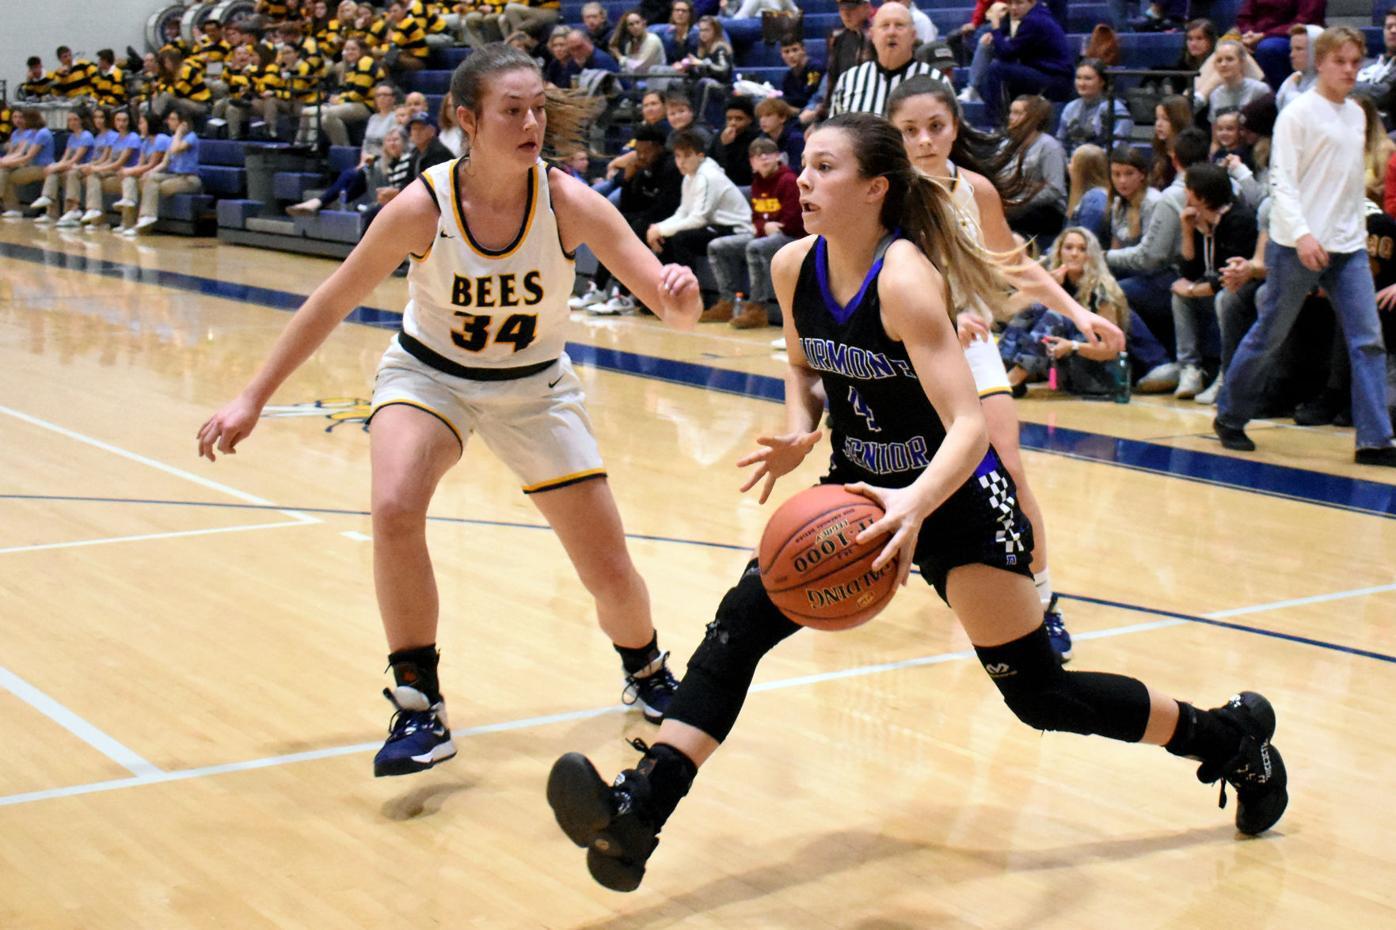 Fairmont Senior's Emily Starn steps into a shot